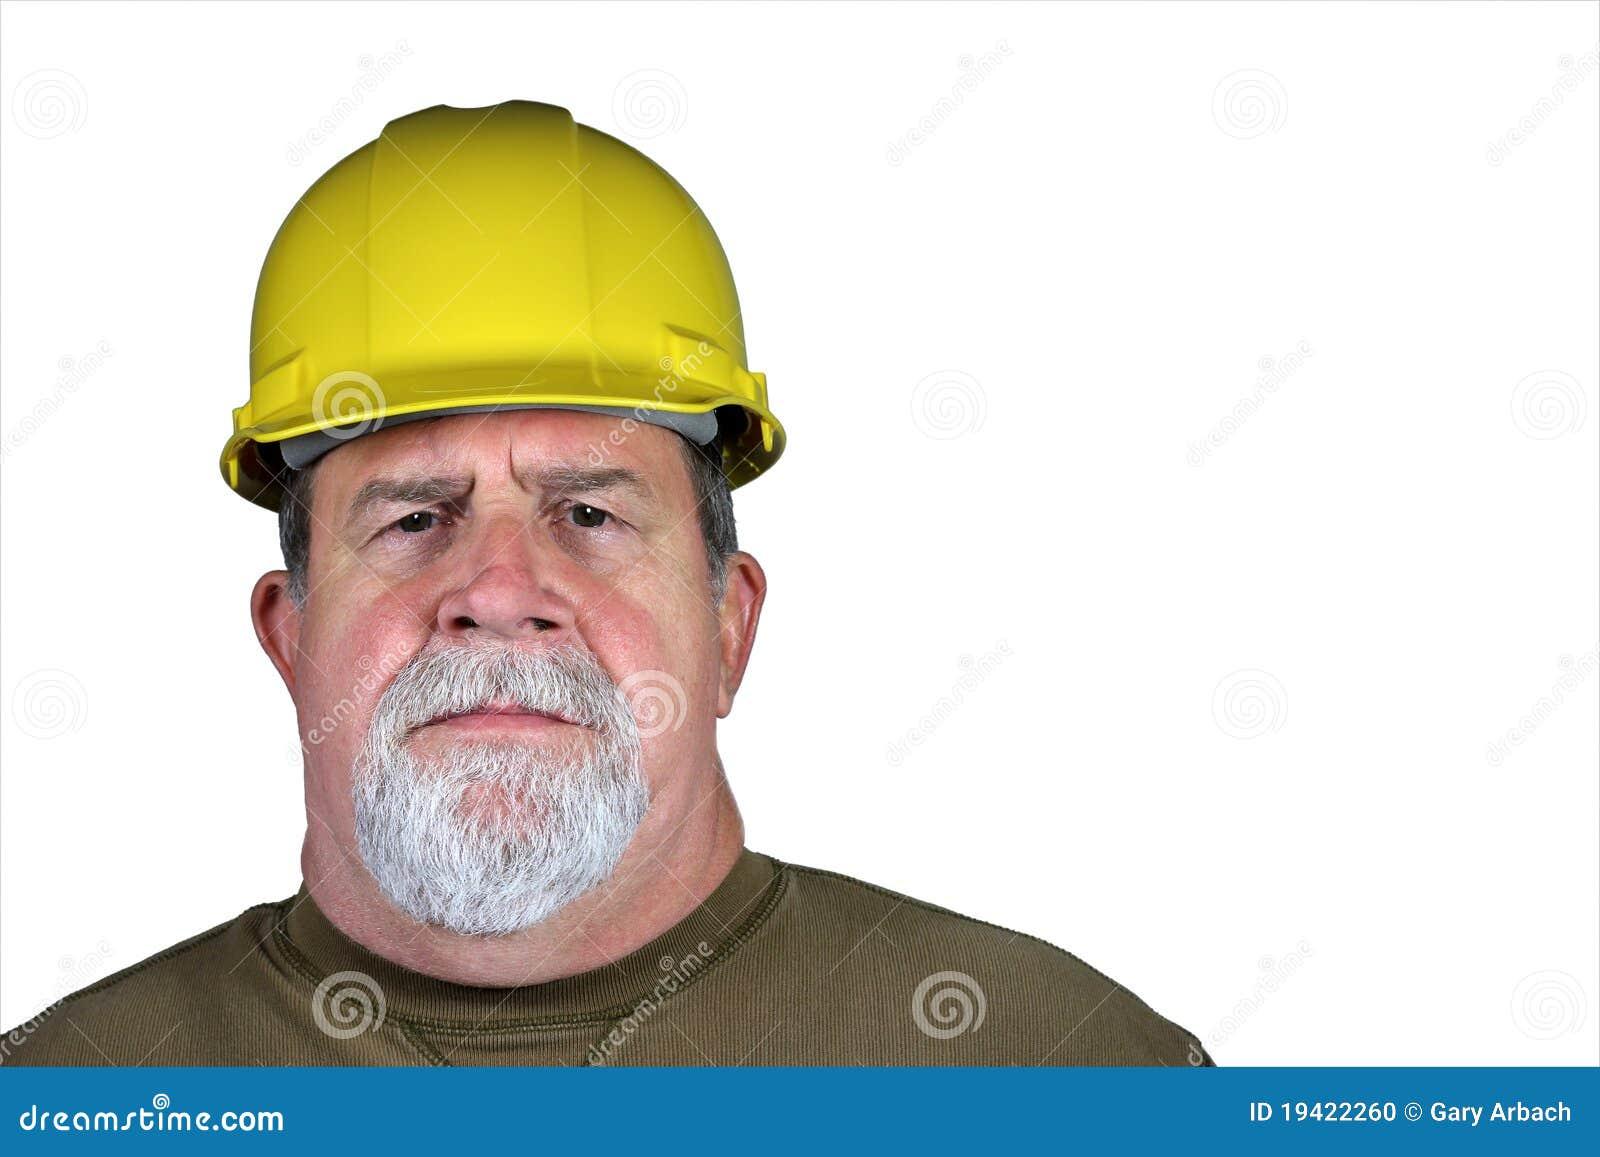 Serious Tough Construction Worker